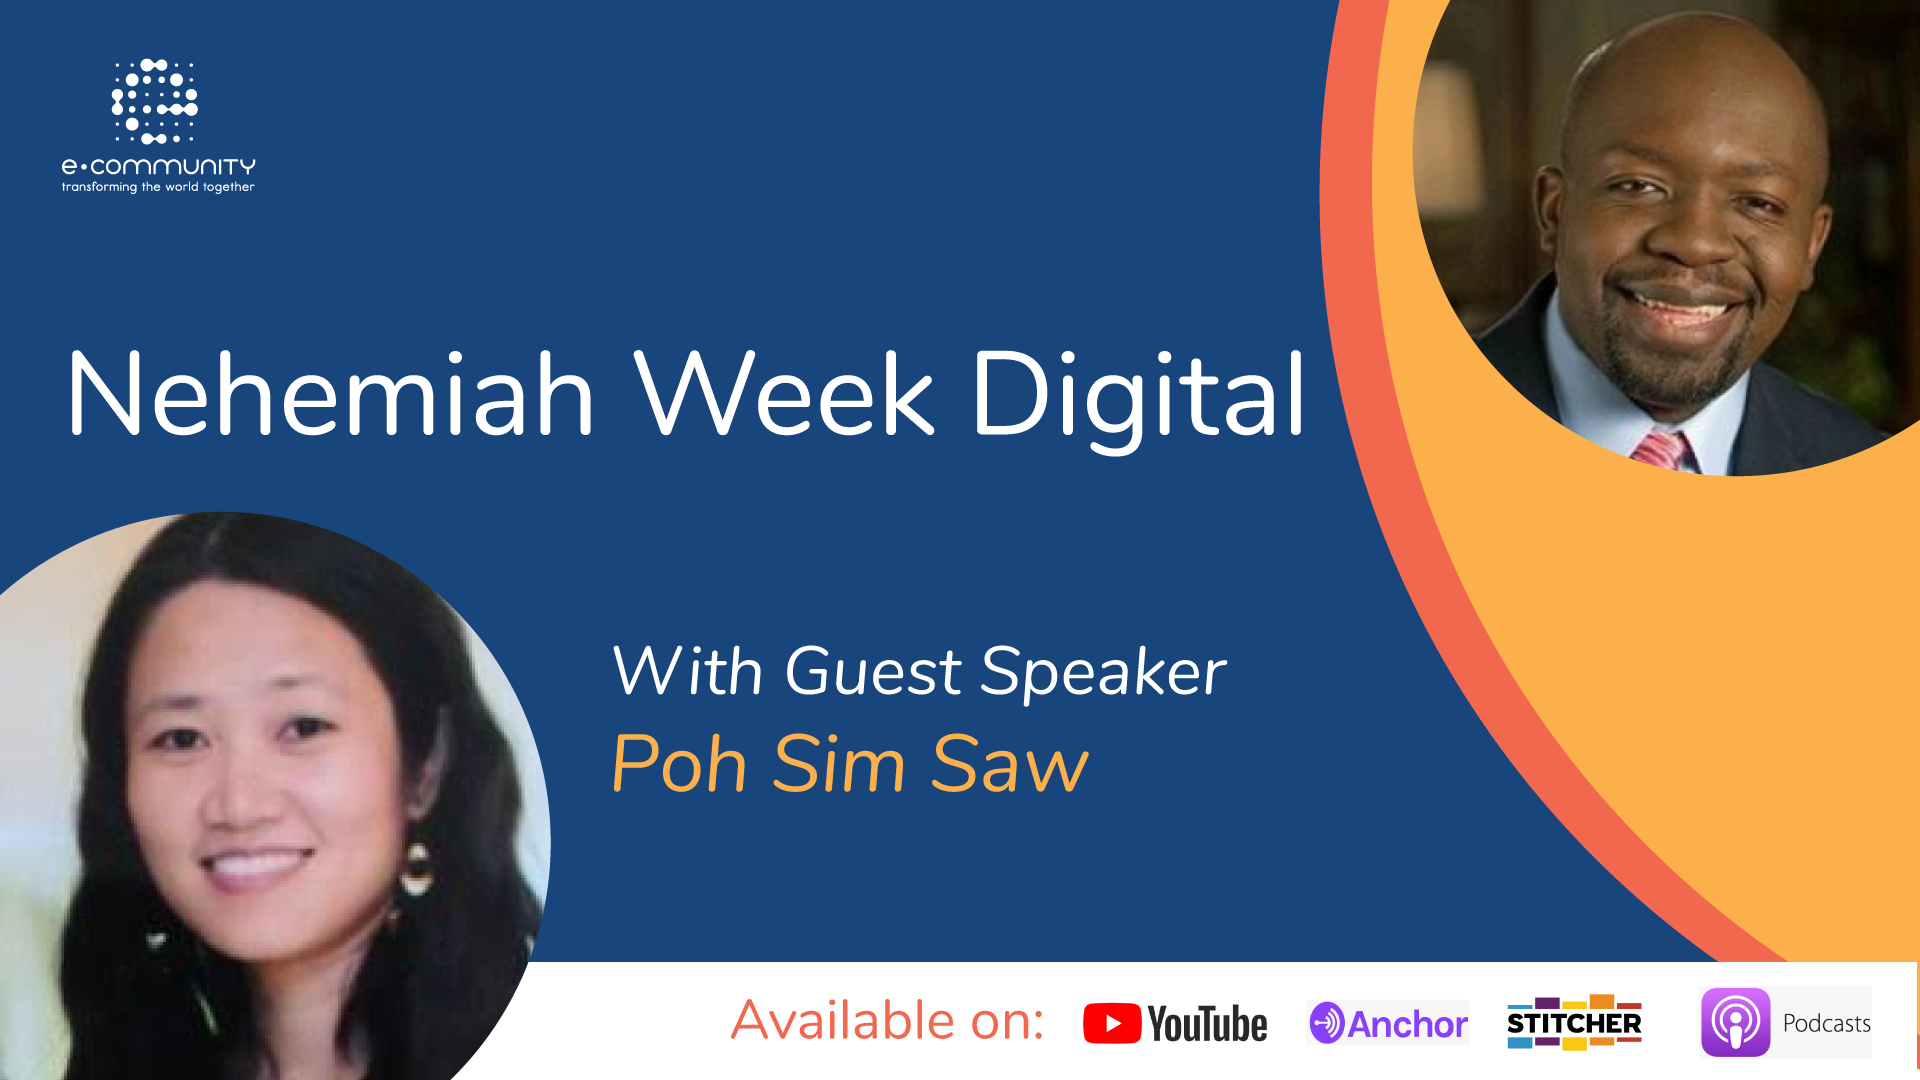 EC Podcast Nehemiah Week Digital with Poh Sim